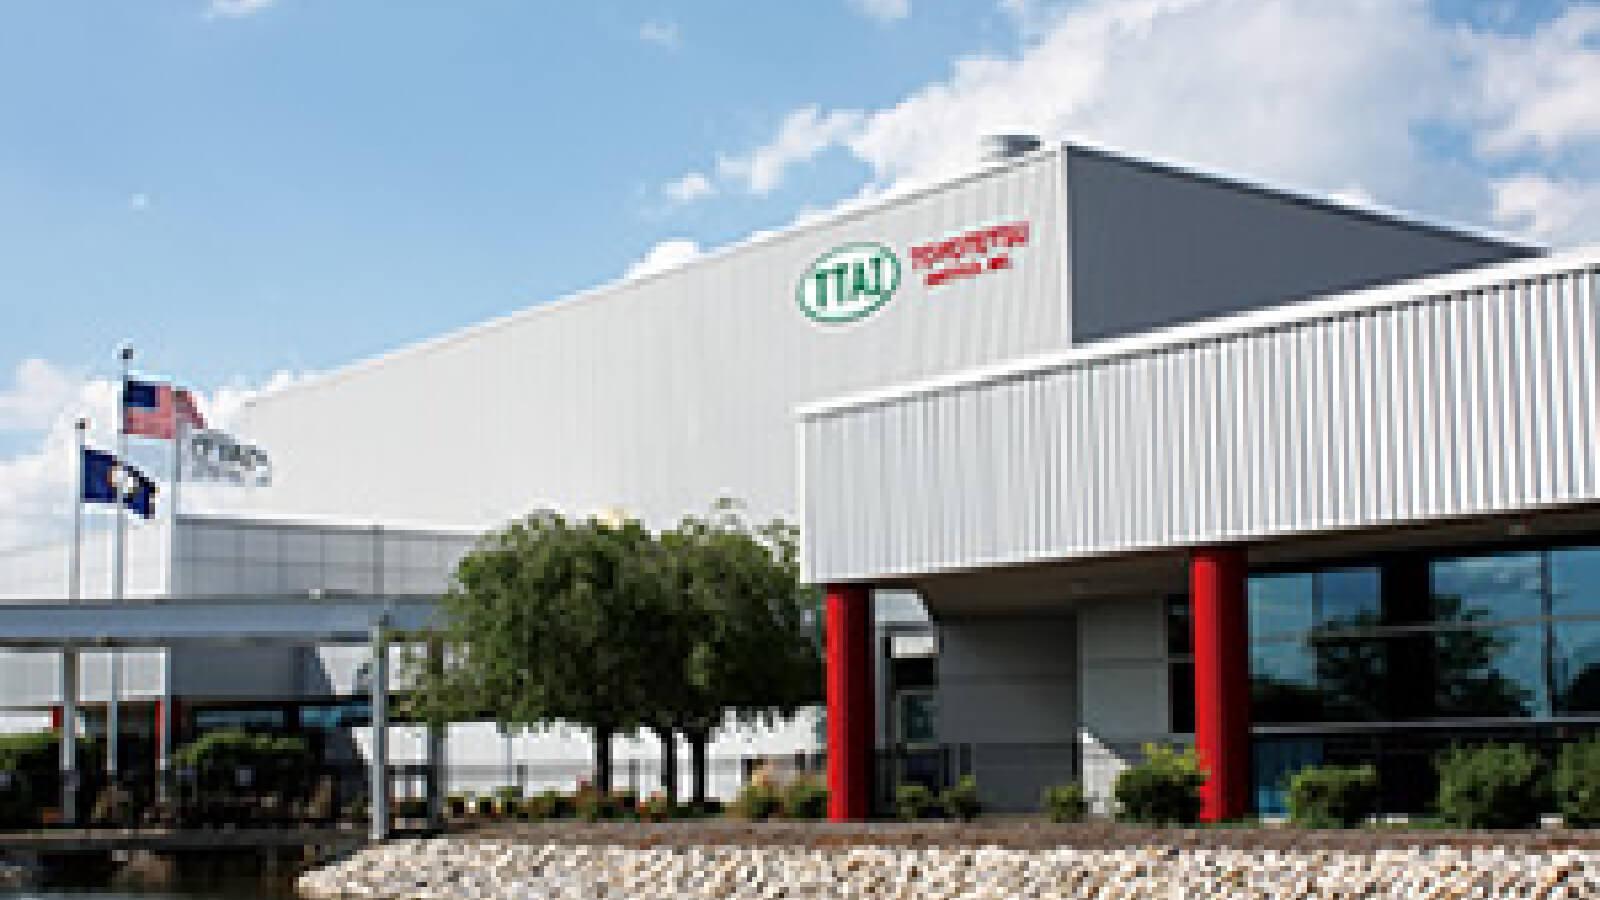 Toyotetsu America, Inc. (TTAI)